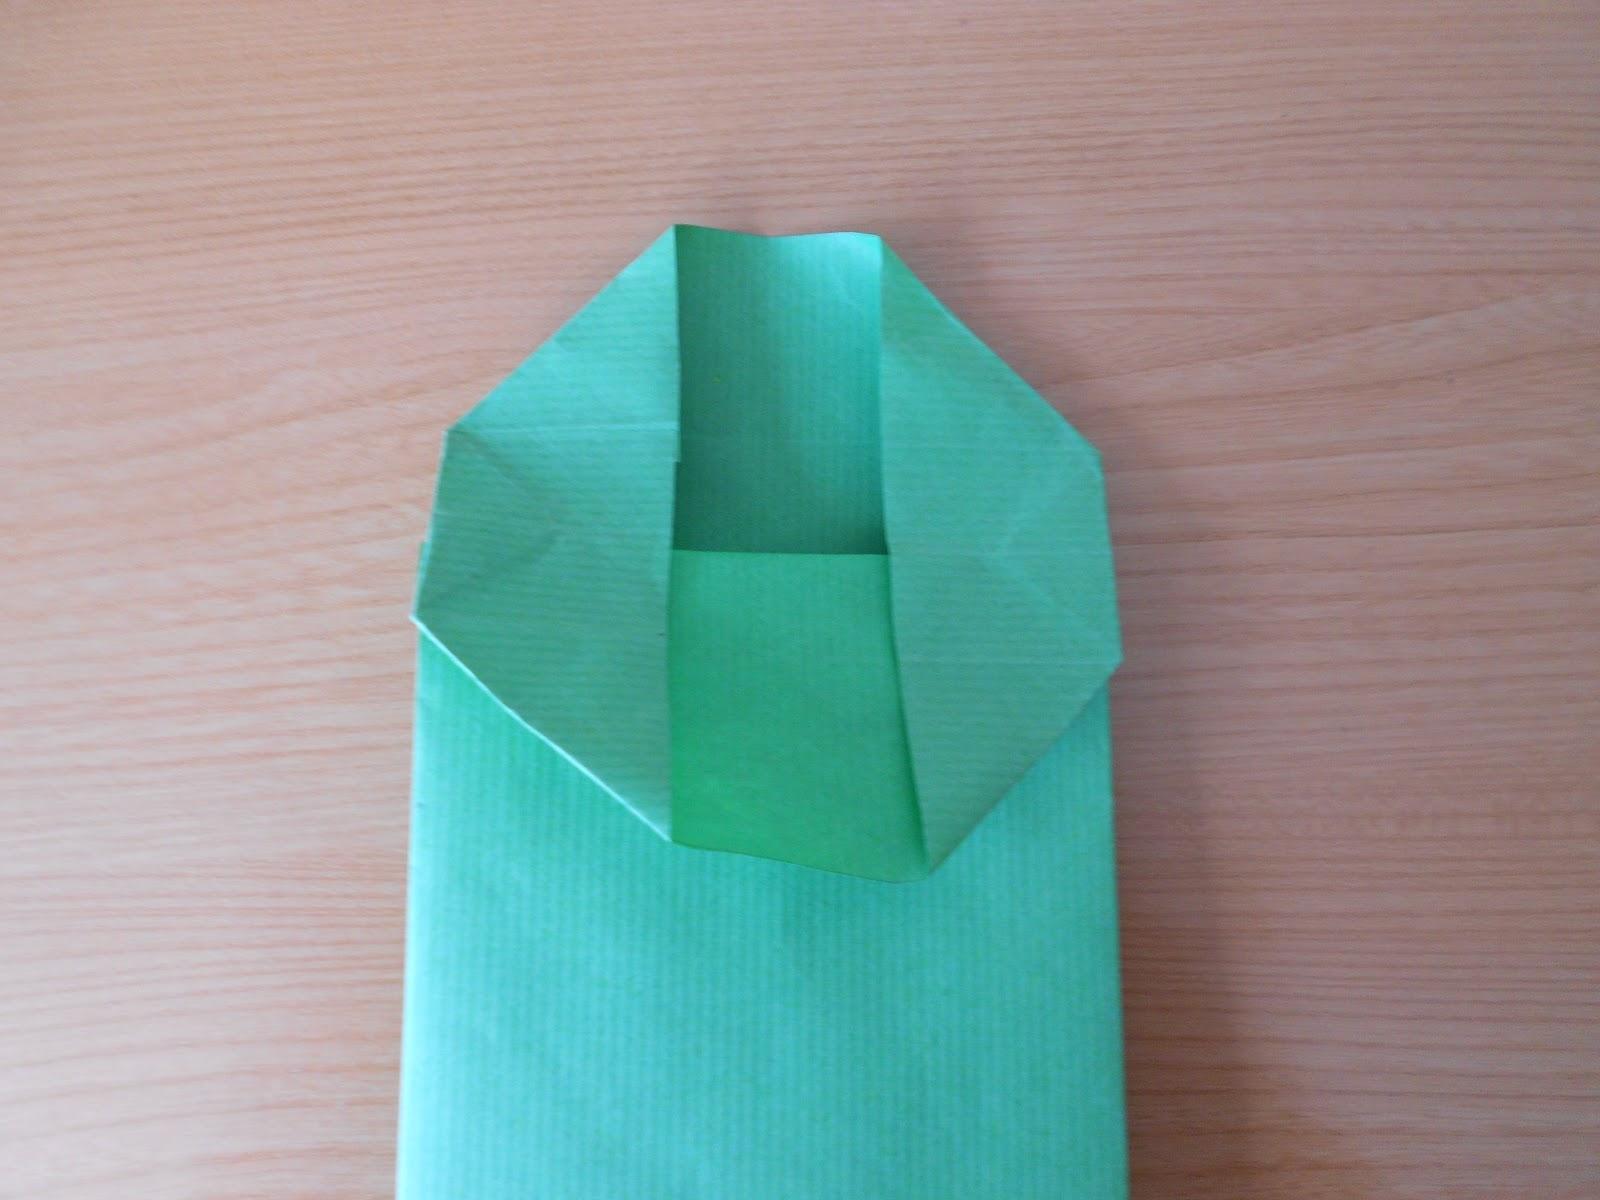 Mar amanual c mo hacer bolsas peque as de papel kraft - Hacer bolsas de papel en casa ...